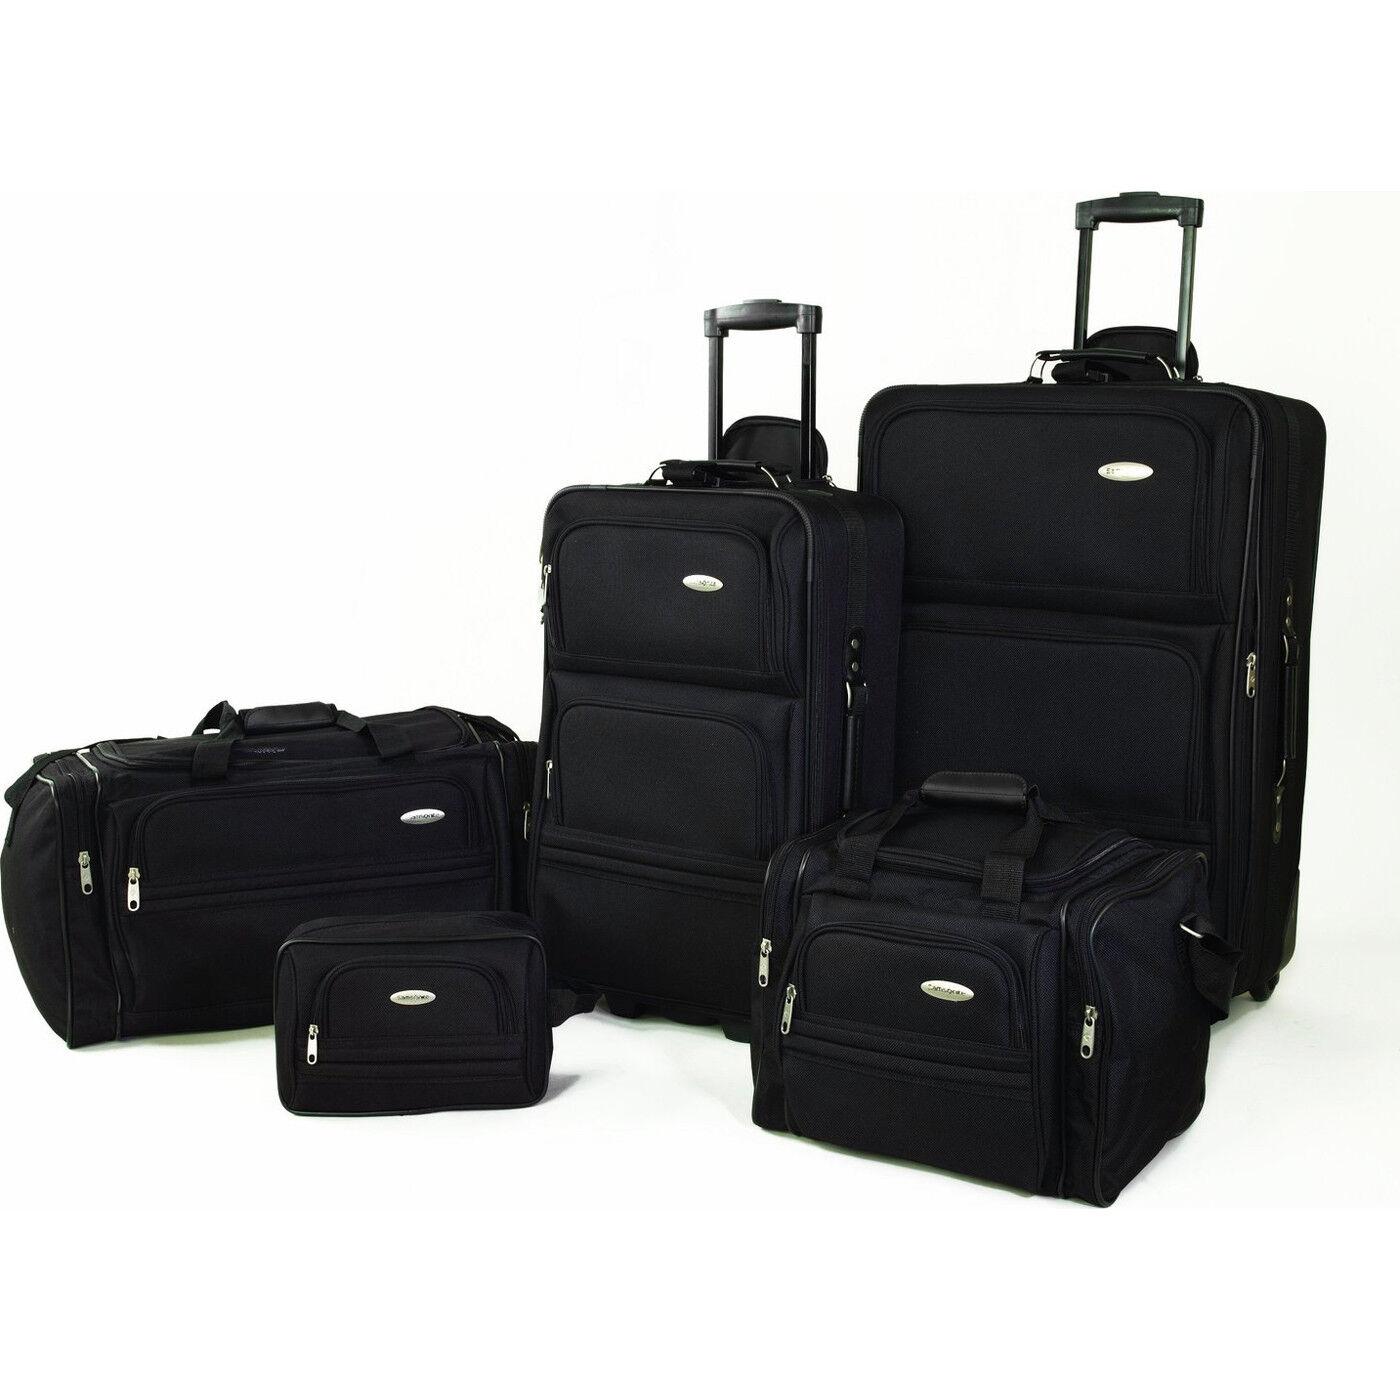 Samsonite 5 Piece Nested Luggage Suitcase Set - 25 Inch, 20